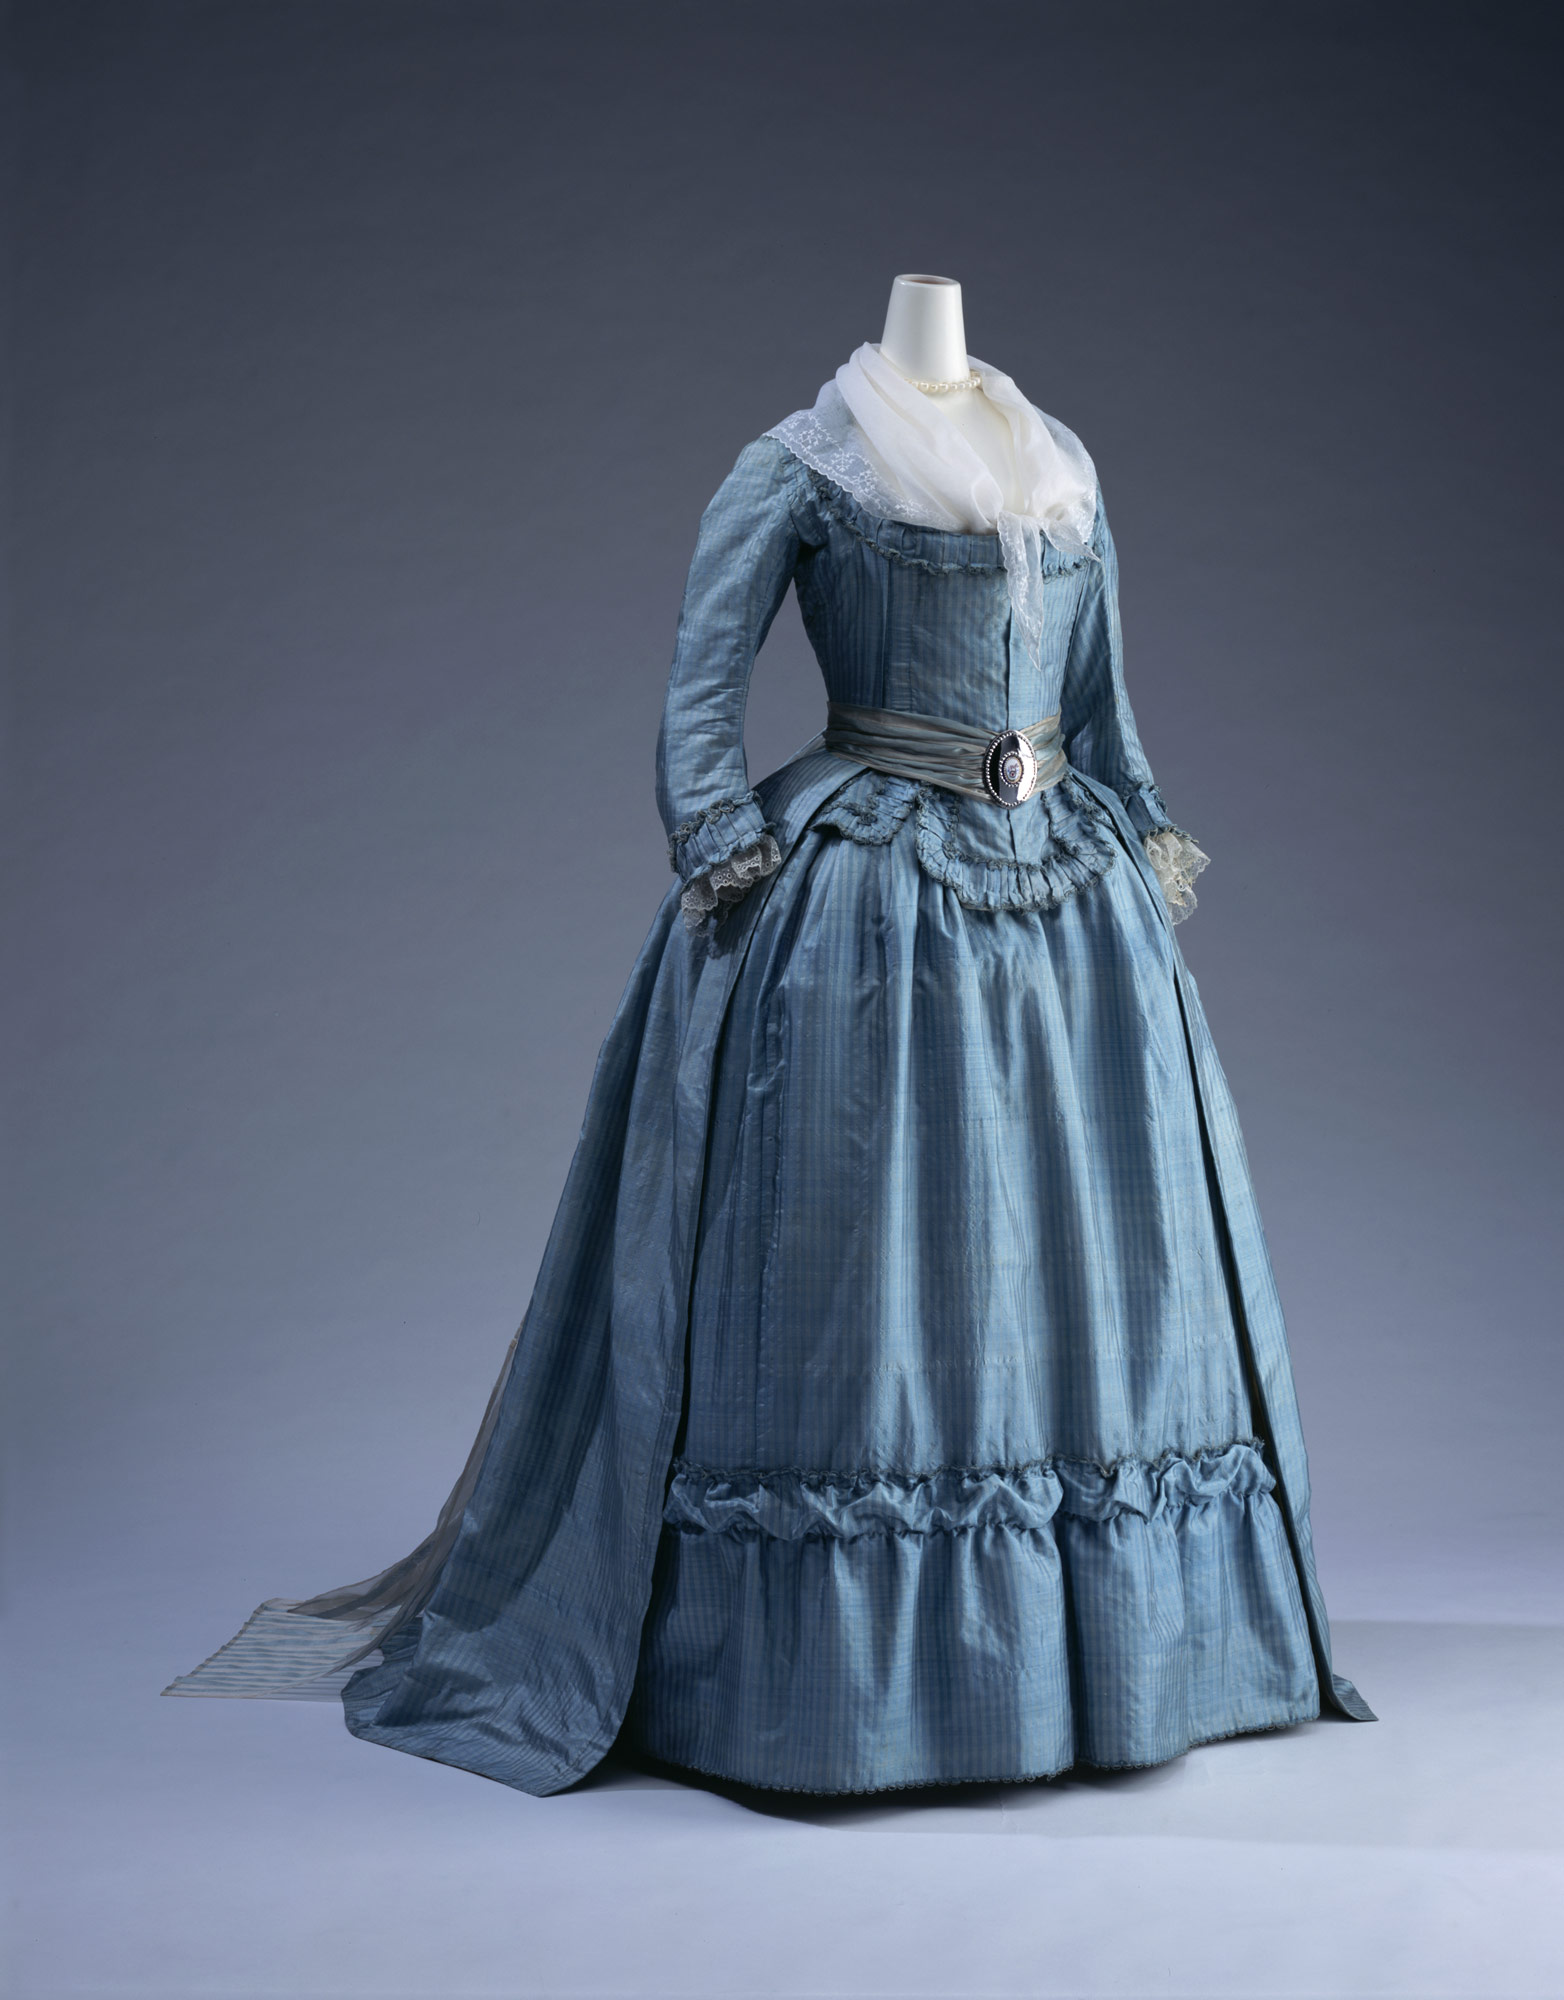 Dress (robe à l'anglaise)